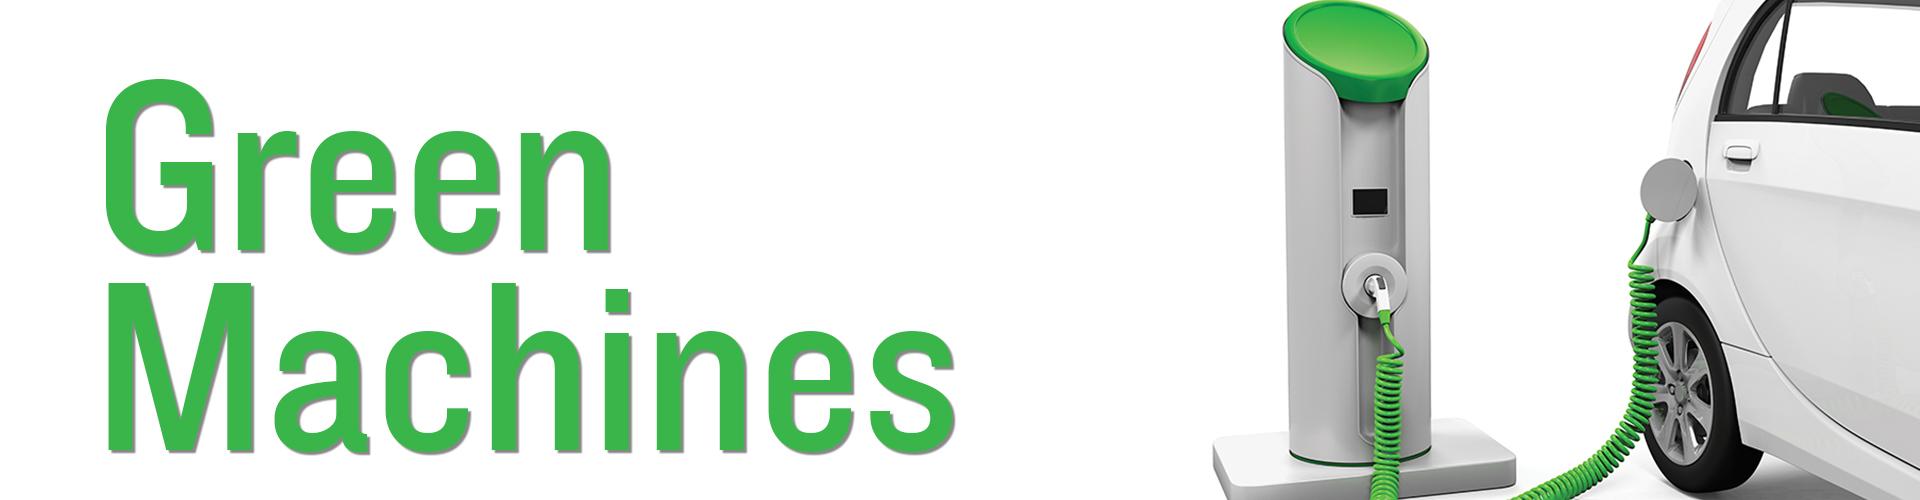 https://www.united-cs.com/sites/united-cs/files/revslider/image/Green%20Machine%20main.jpg